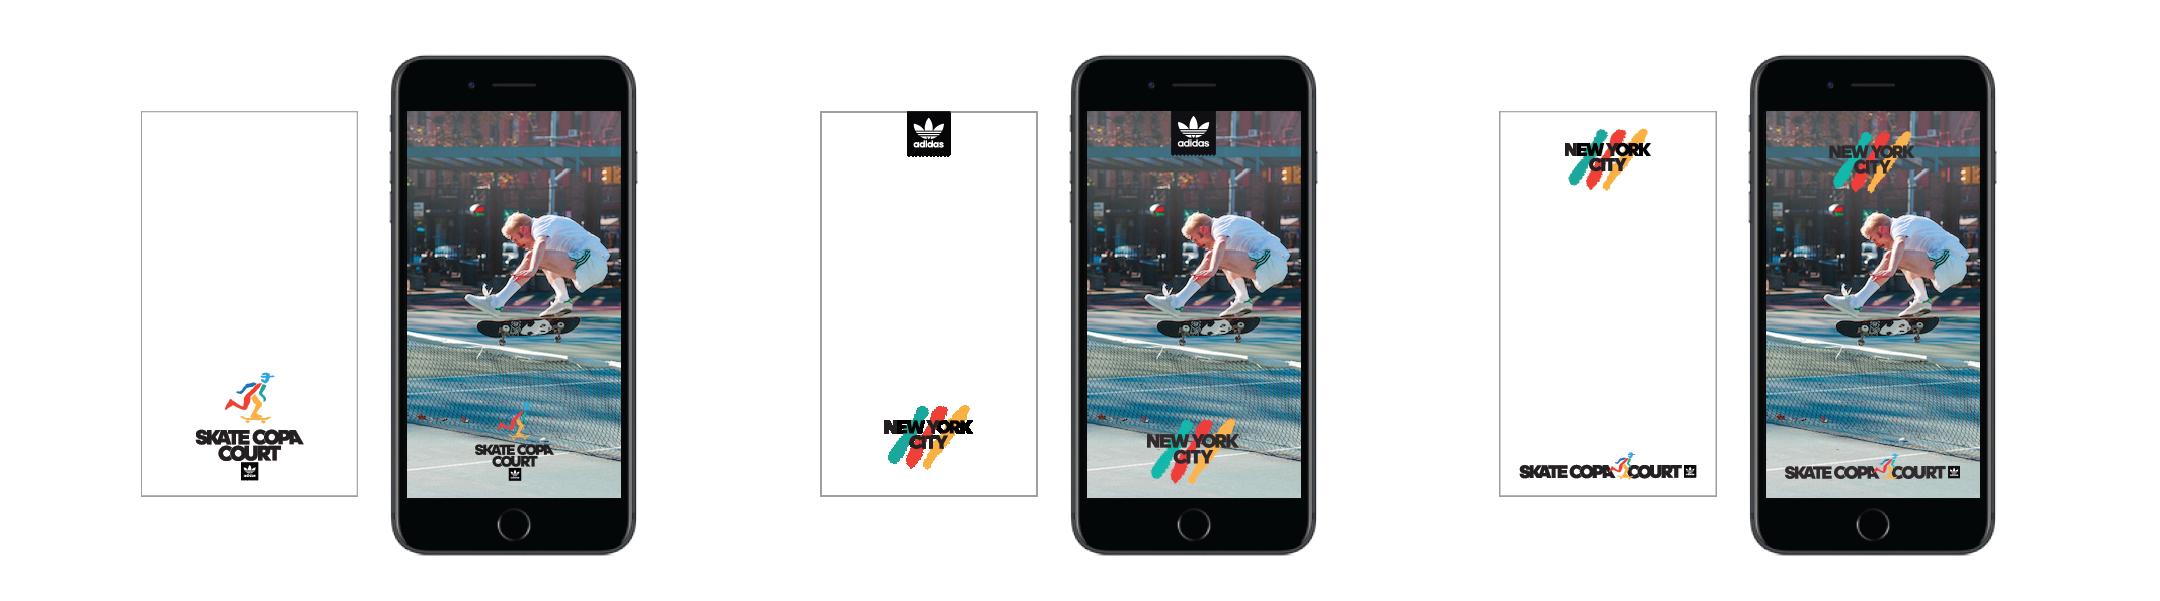 SkateCopaCourt_Social-3